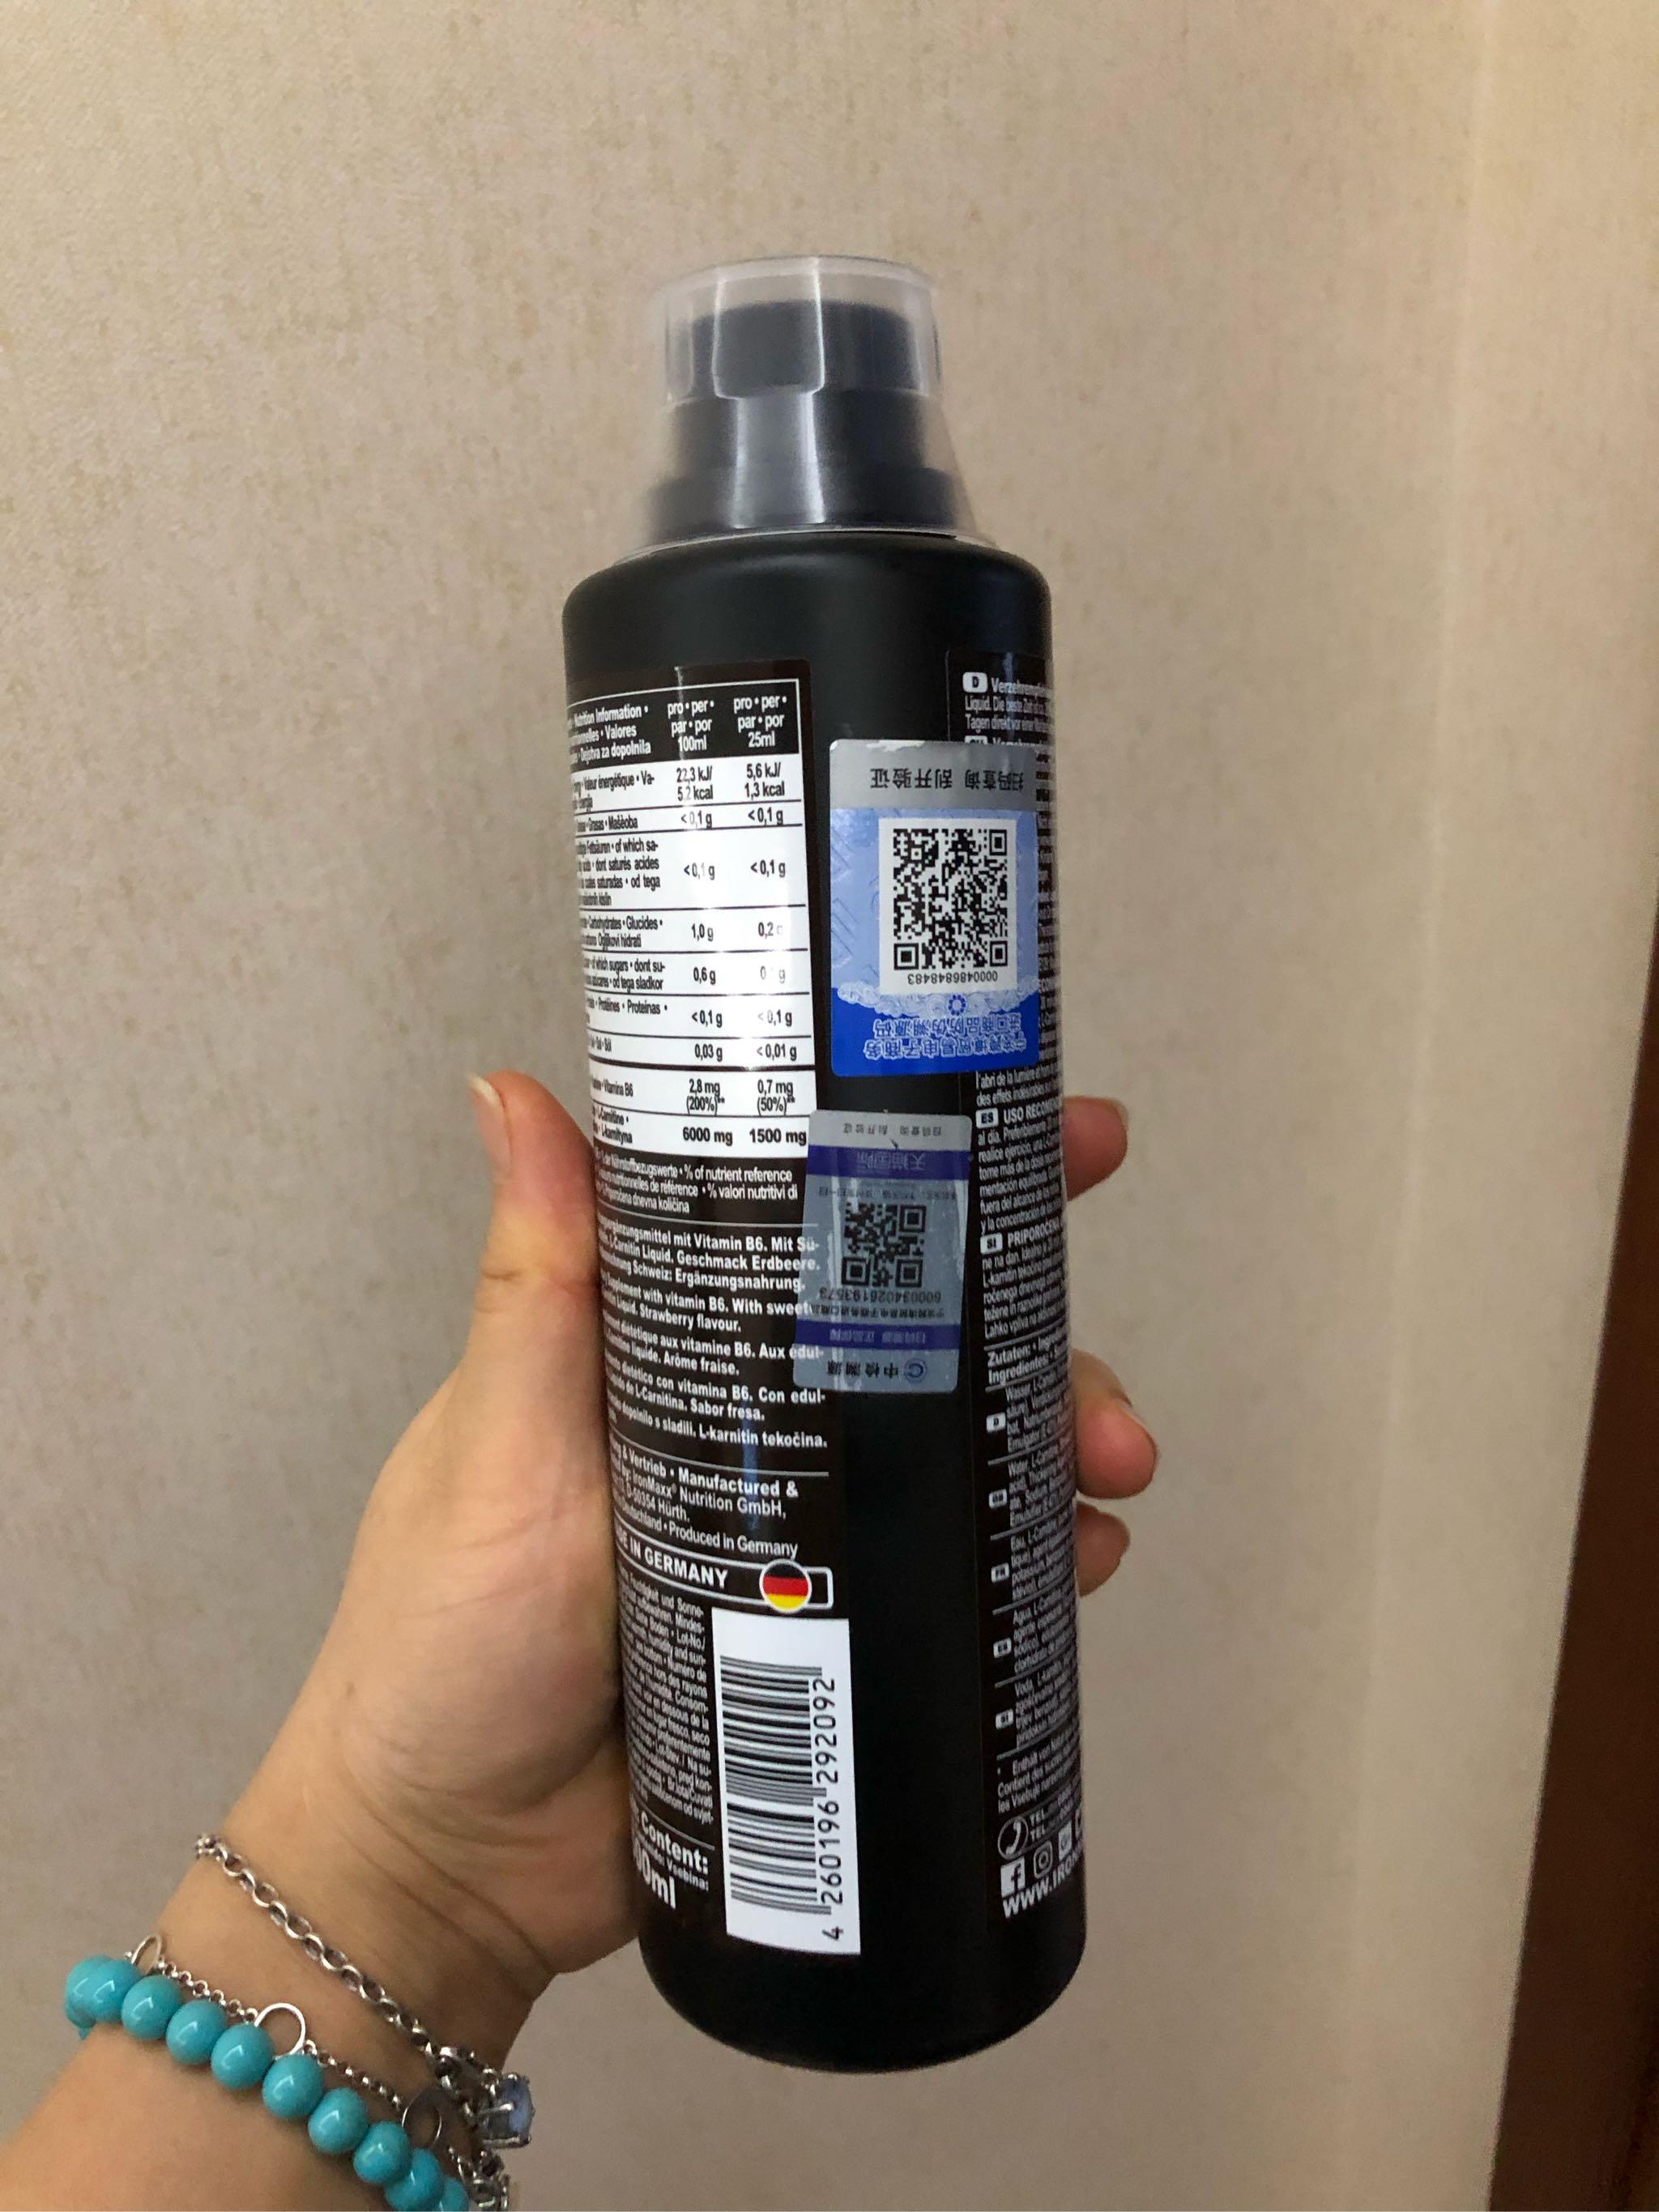 ironmaxx是我第一次用的液体左旋肉碱减肥药,用了很安全